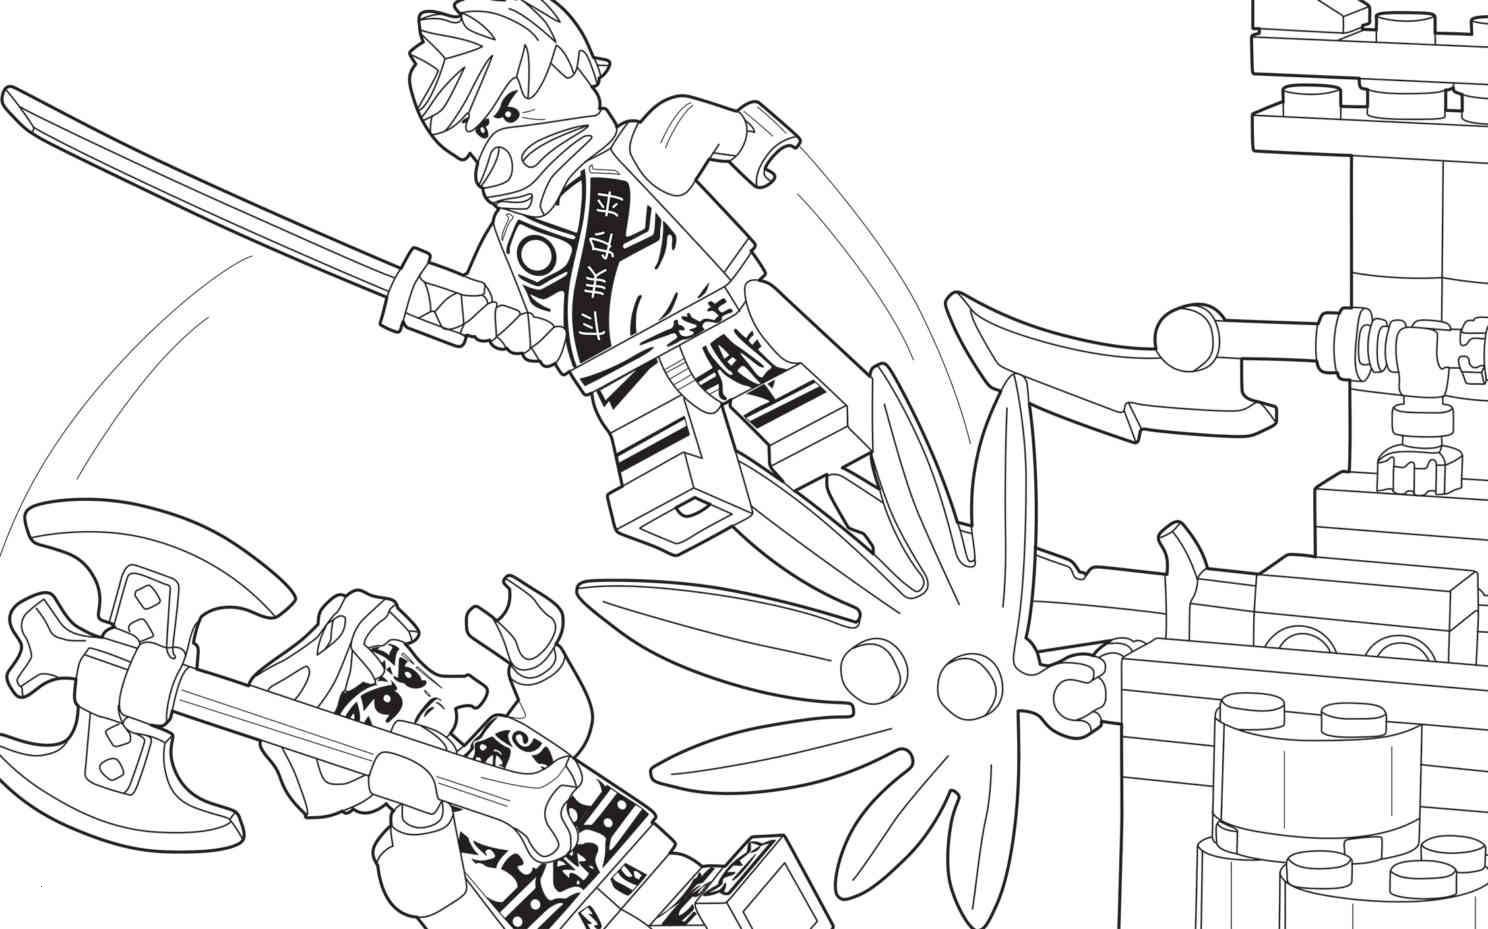 Ninjago Lloyd Ausmalbilder Das Beste Von Ninjago Malvorlagen Zum Ausdrucken Schön 37 Lego Ninjago Lloyd Bild